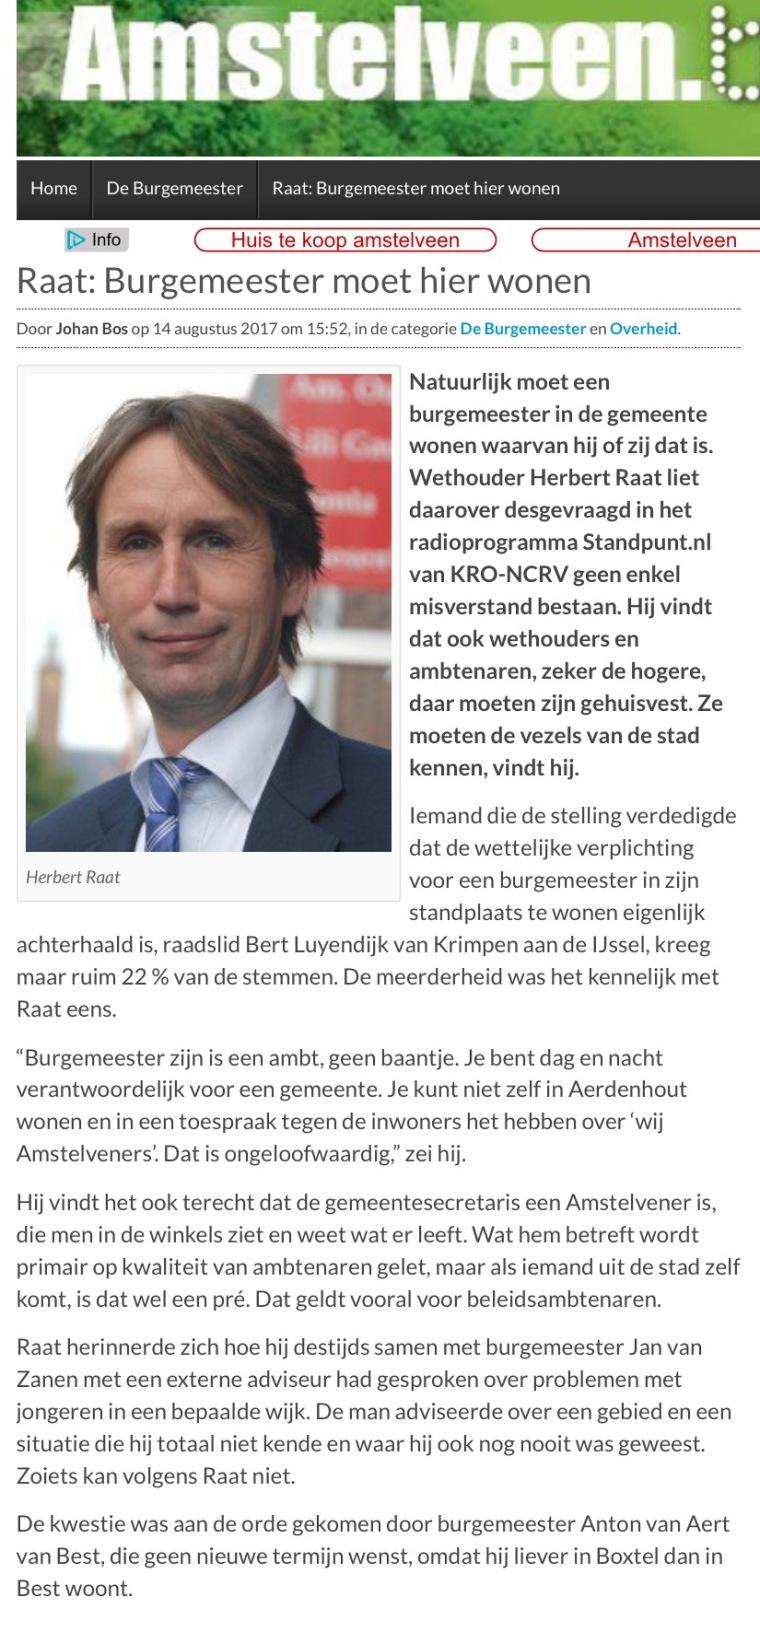 2017-14-8 Amstelveenblog.nl; wethouder Herbert Raat over woonplaats burgemeester